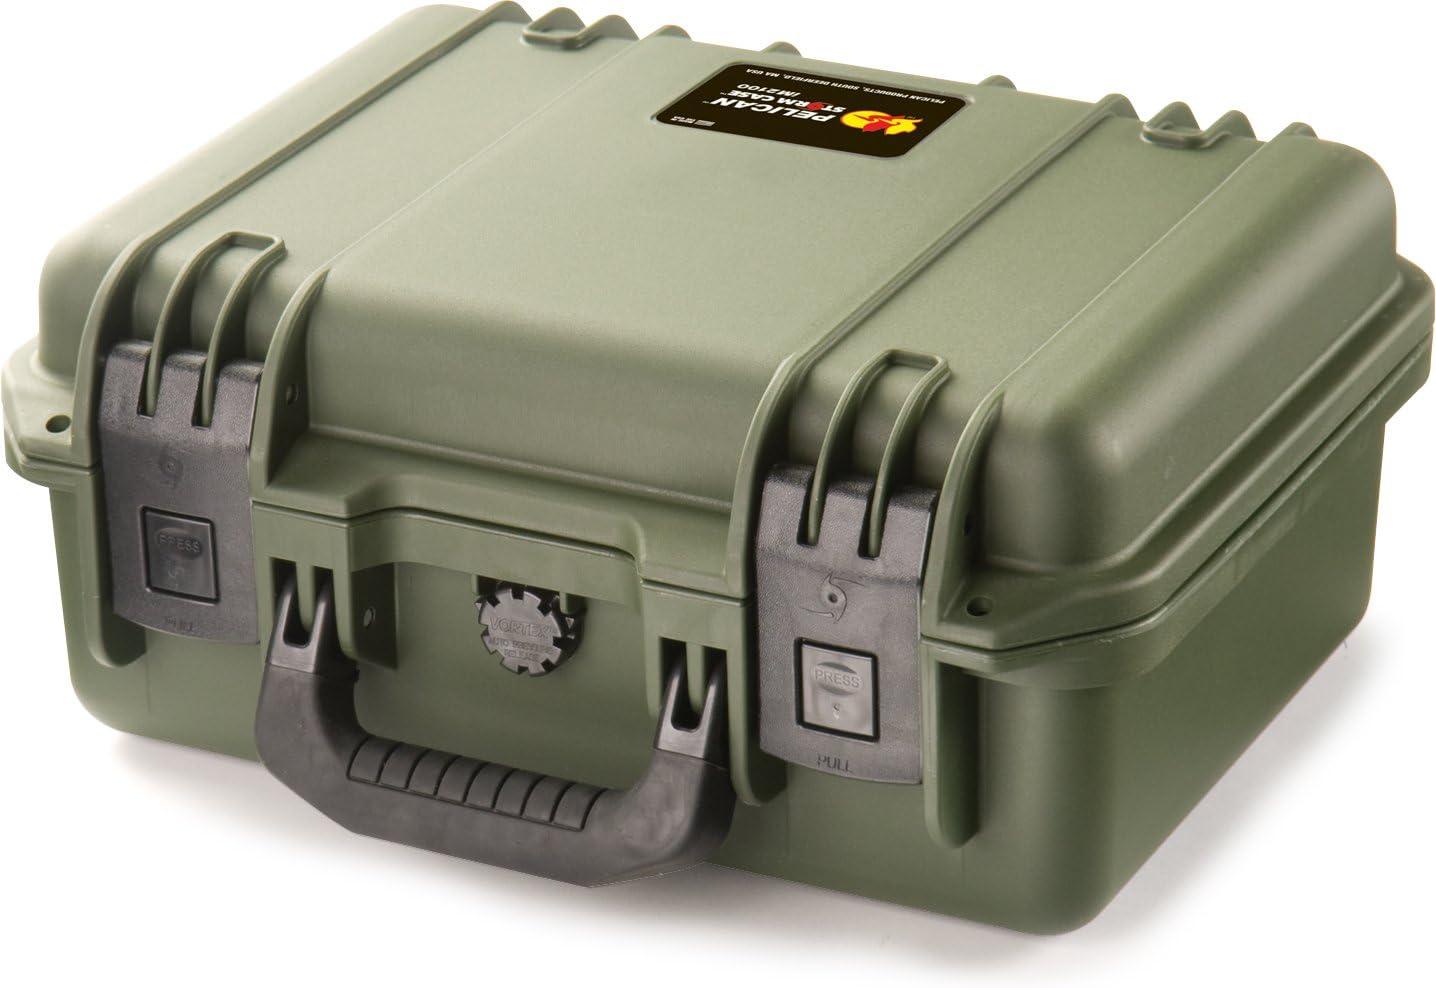 CVPKG presents - Pelican iM2100 OD Green With foam